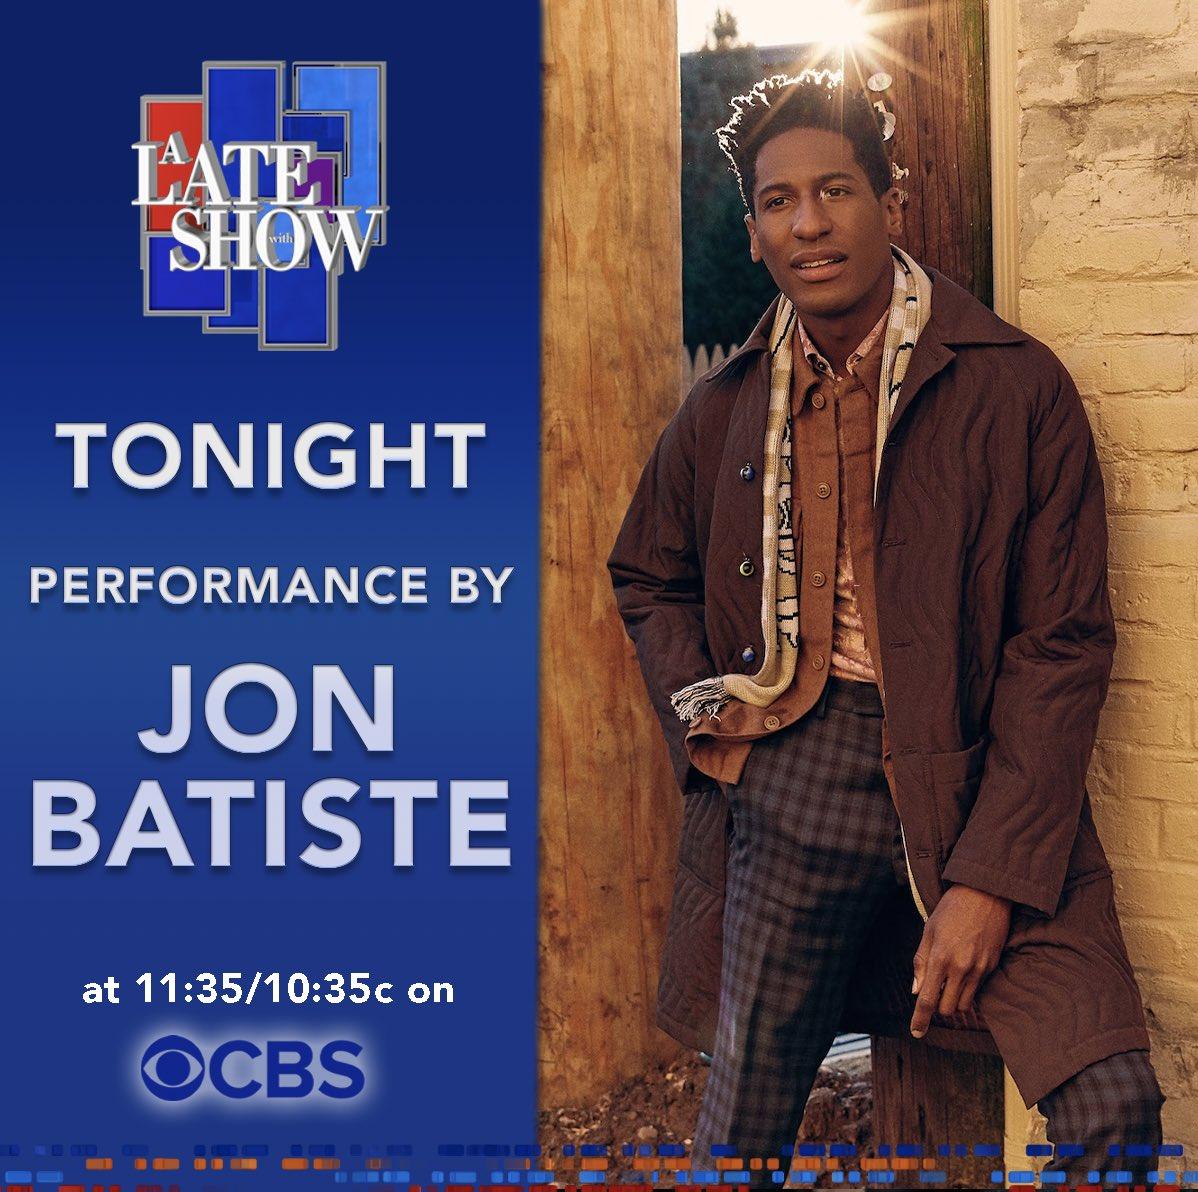 Replying to @JonBatiste: Tonight on @colbertlateshow ✅  #LSSC #PlayAtHome